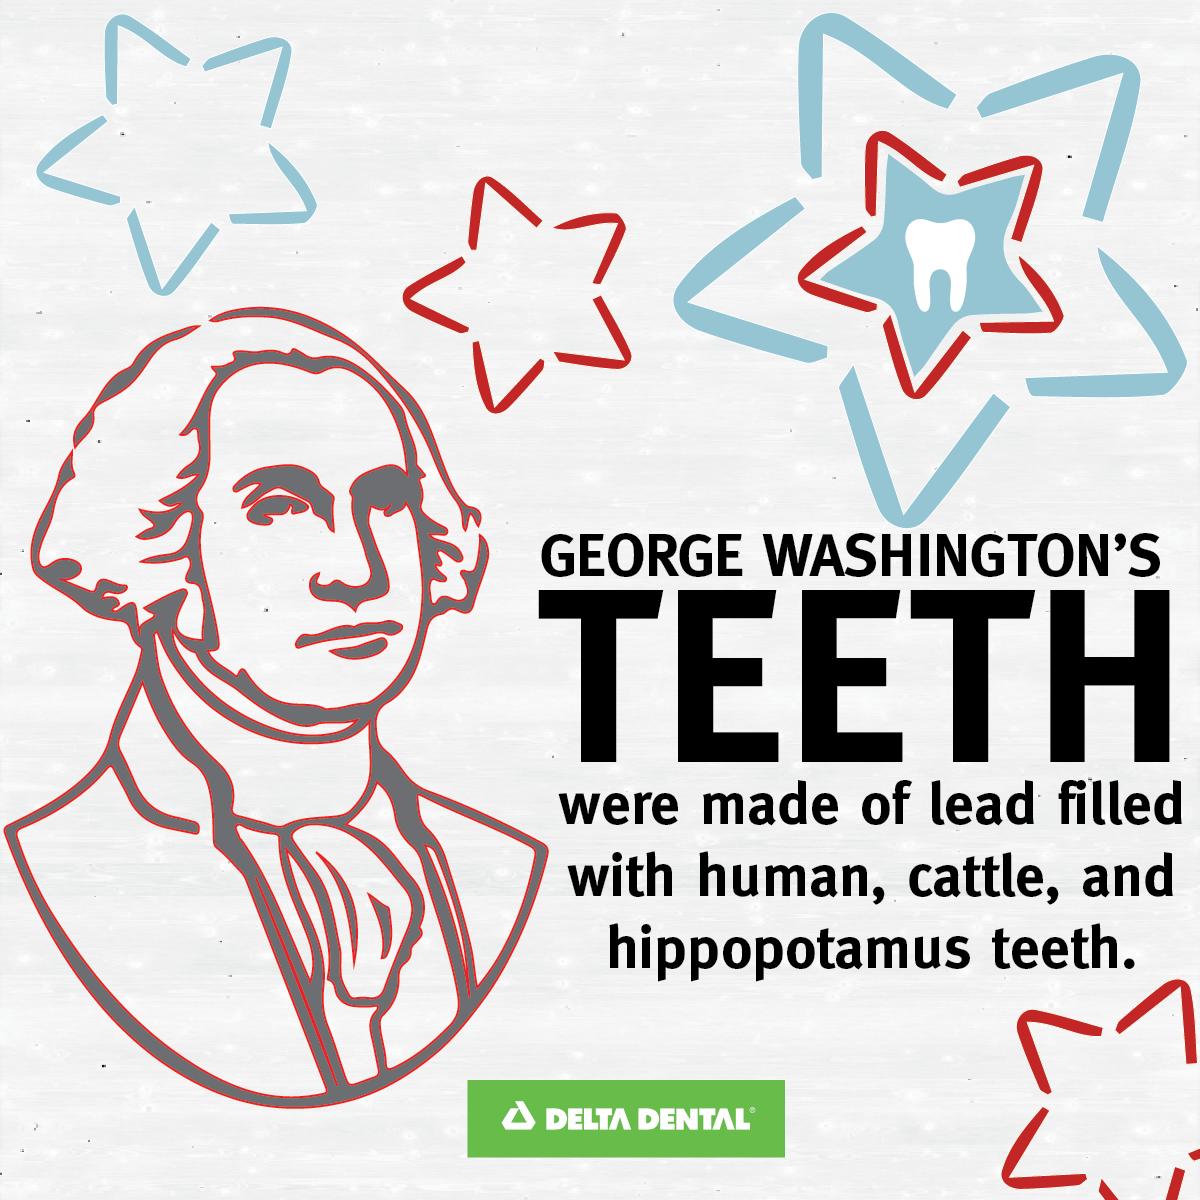 Washington's teeth weren't made of wood. His teeth were actually made of animal bones! #DeltaDental